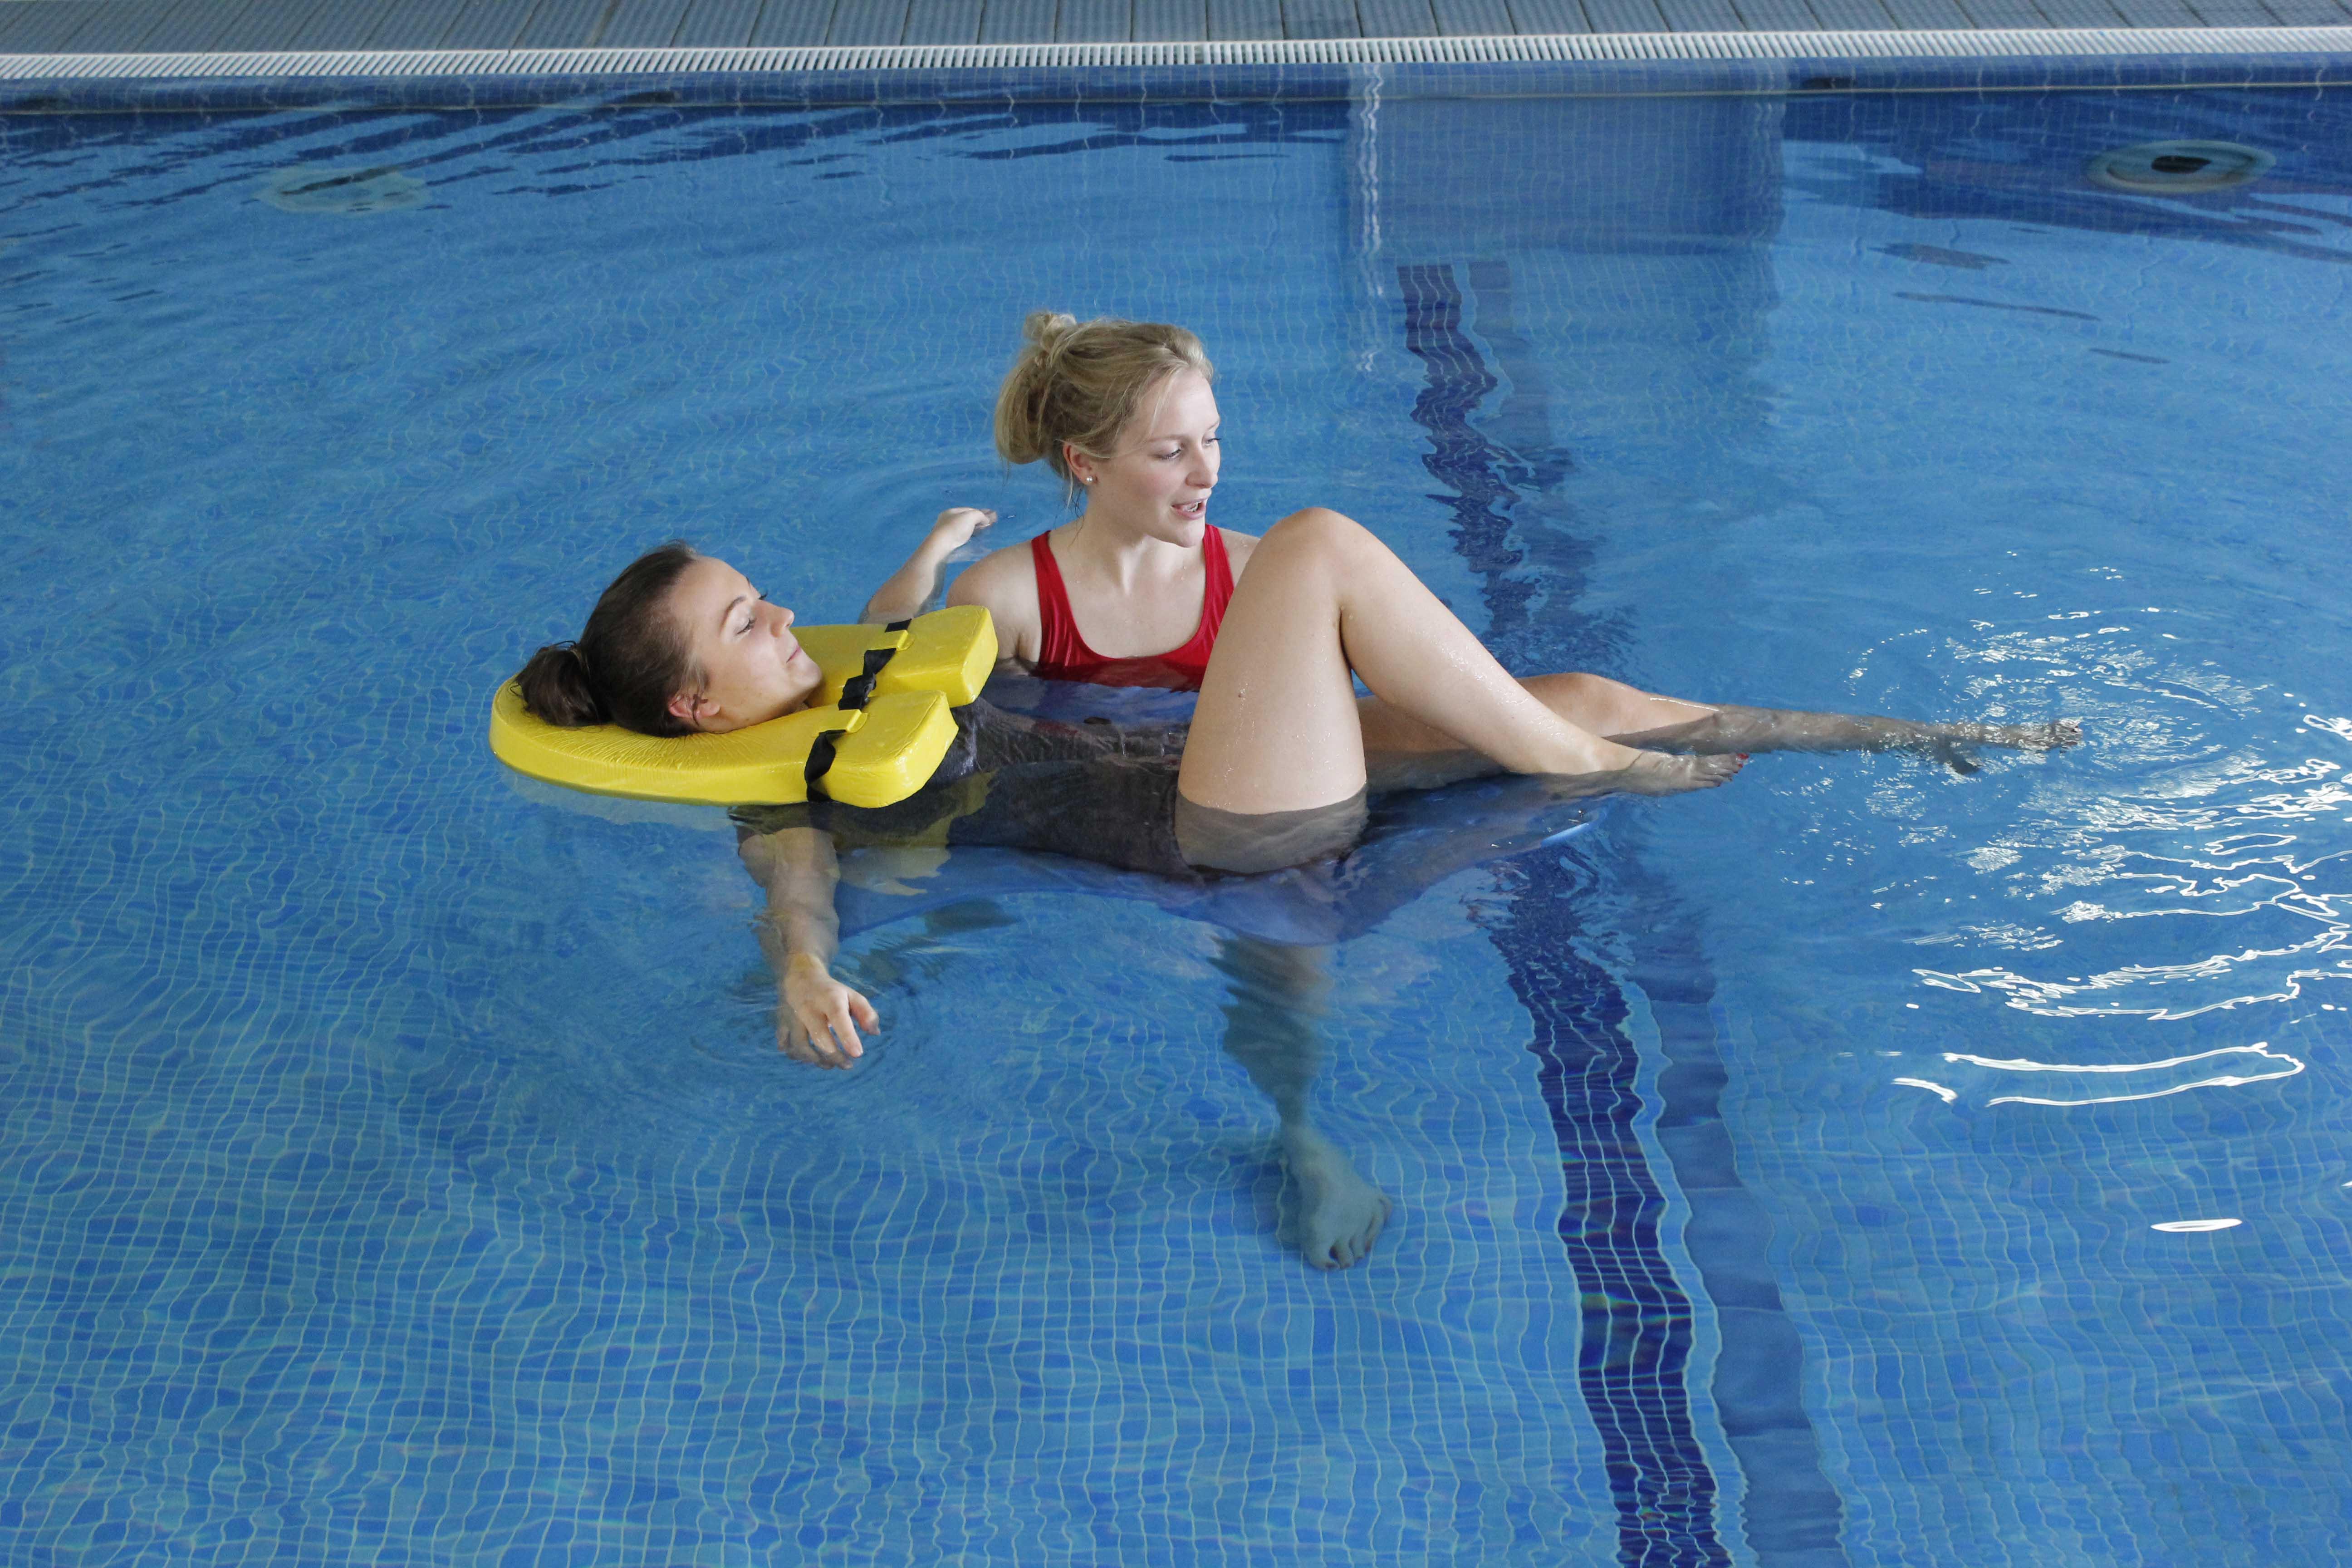 Sesión de hidroterapia con estrecha supervisión de fisioterapeuta especialista.